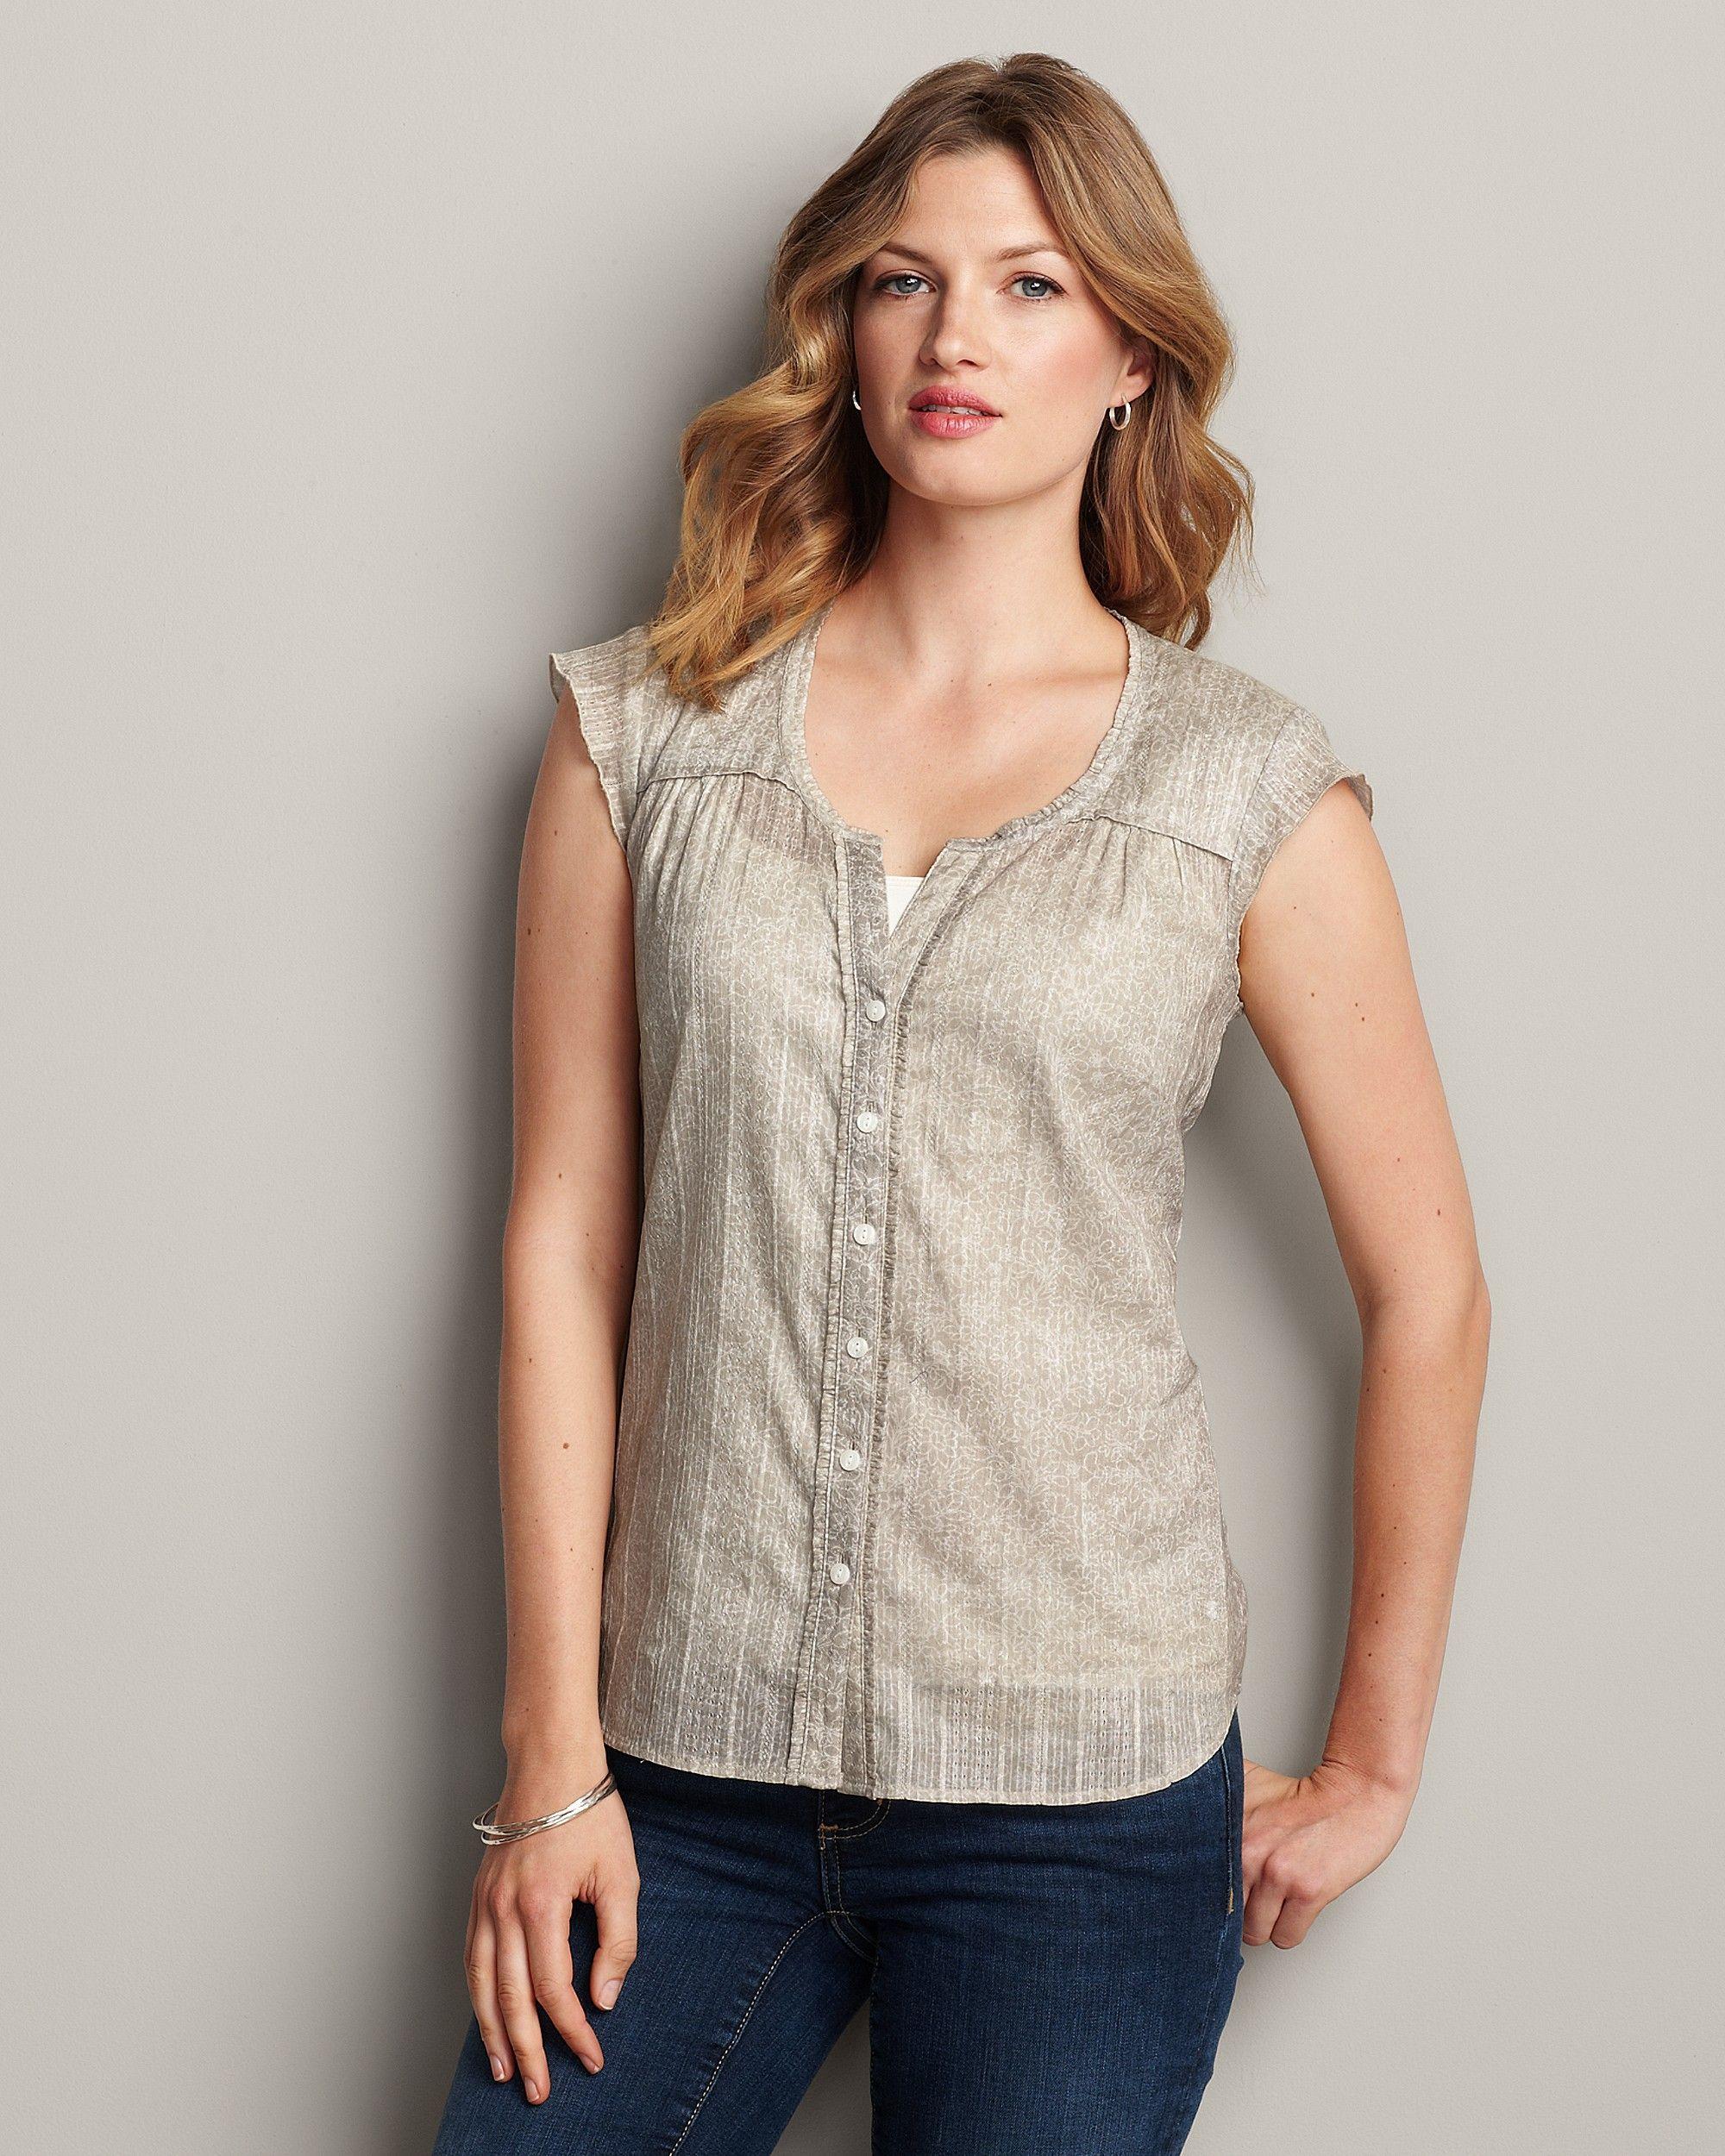 Printed Underpinning Shirt Eddie Bauer Tops, Clothes